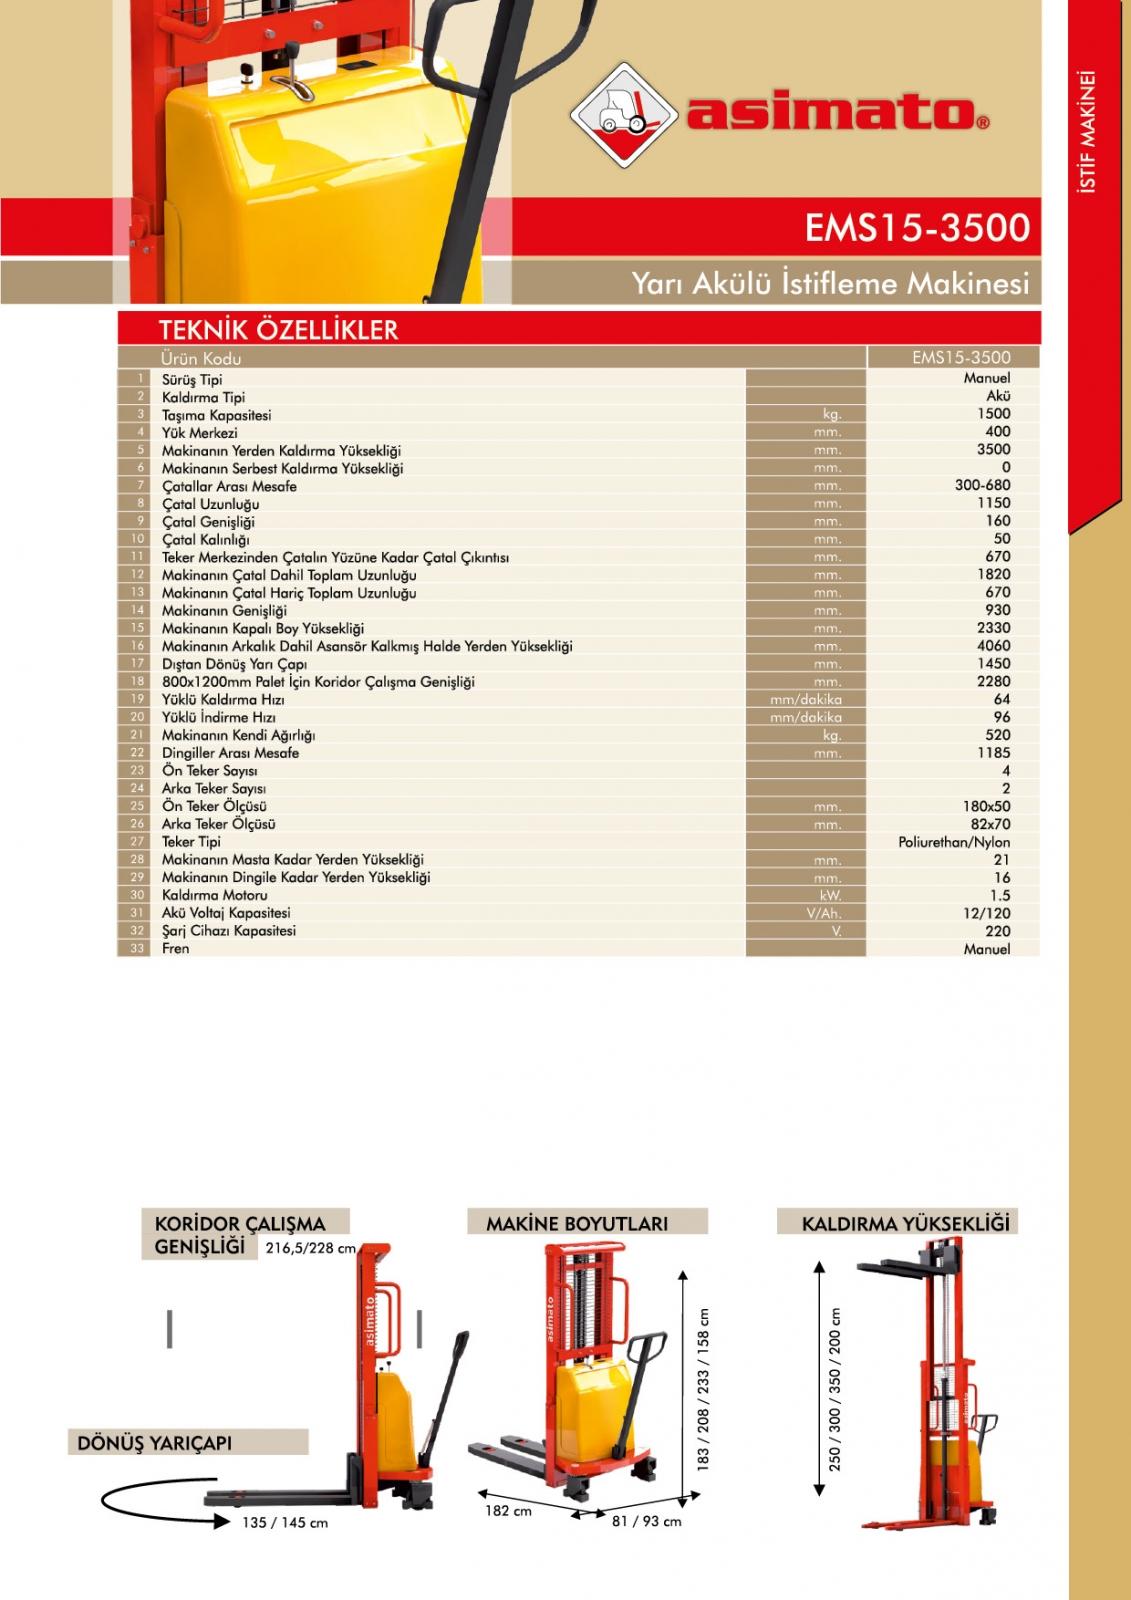 EMS15 SERİSİ 1.5 TON 3.5 METRE YARI AKÜLÜ İSTİF MAKİNESİ